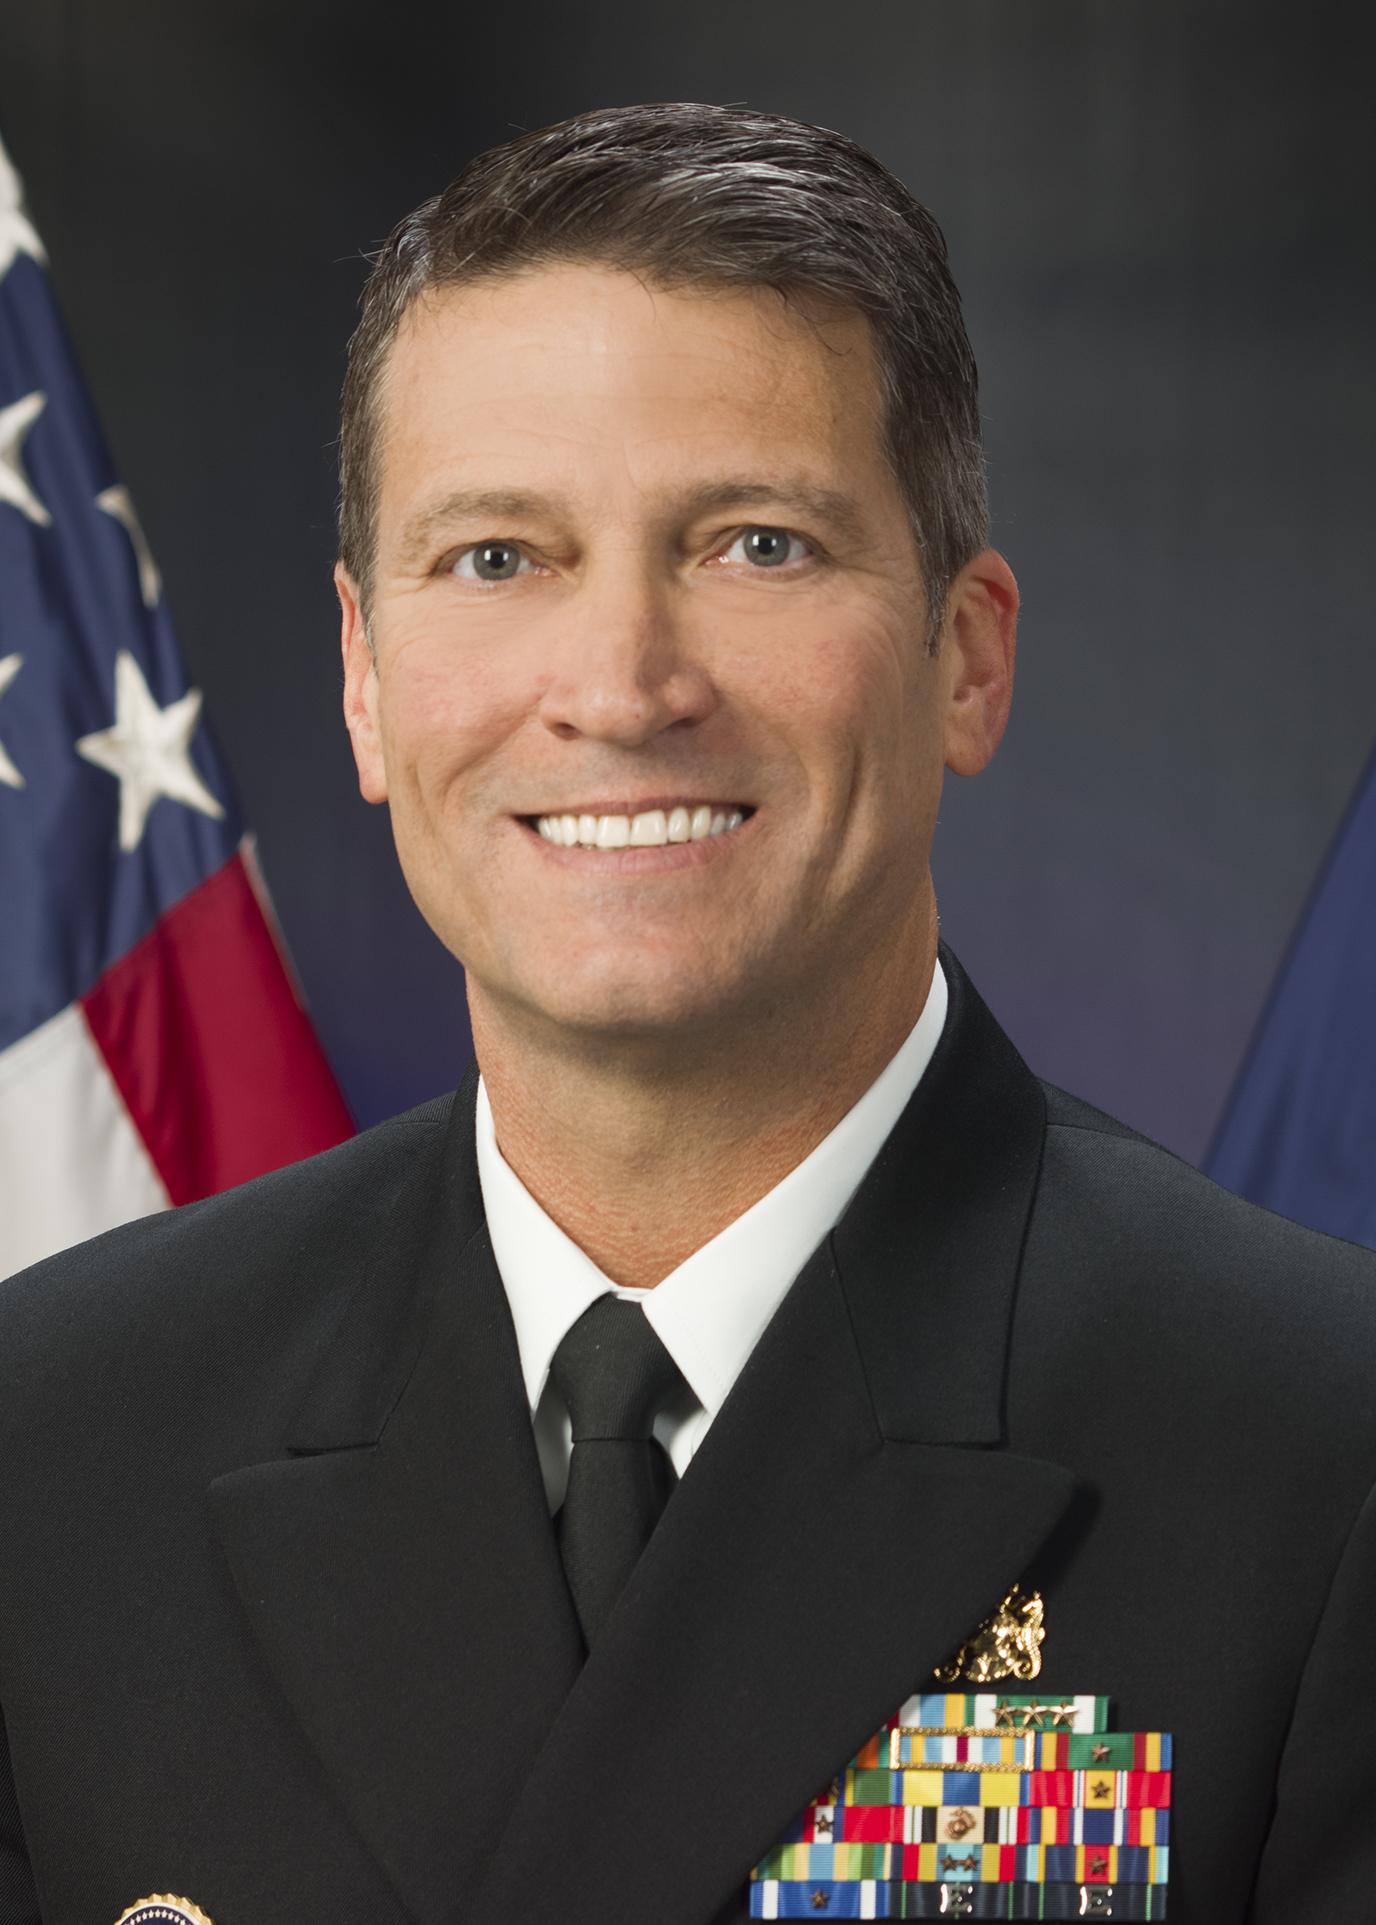 Jackson, White House doctor and Groton sub base grad, withdraws as VA nominee